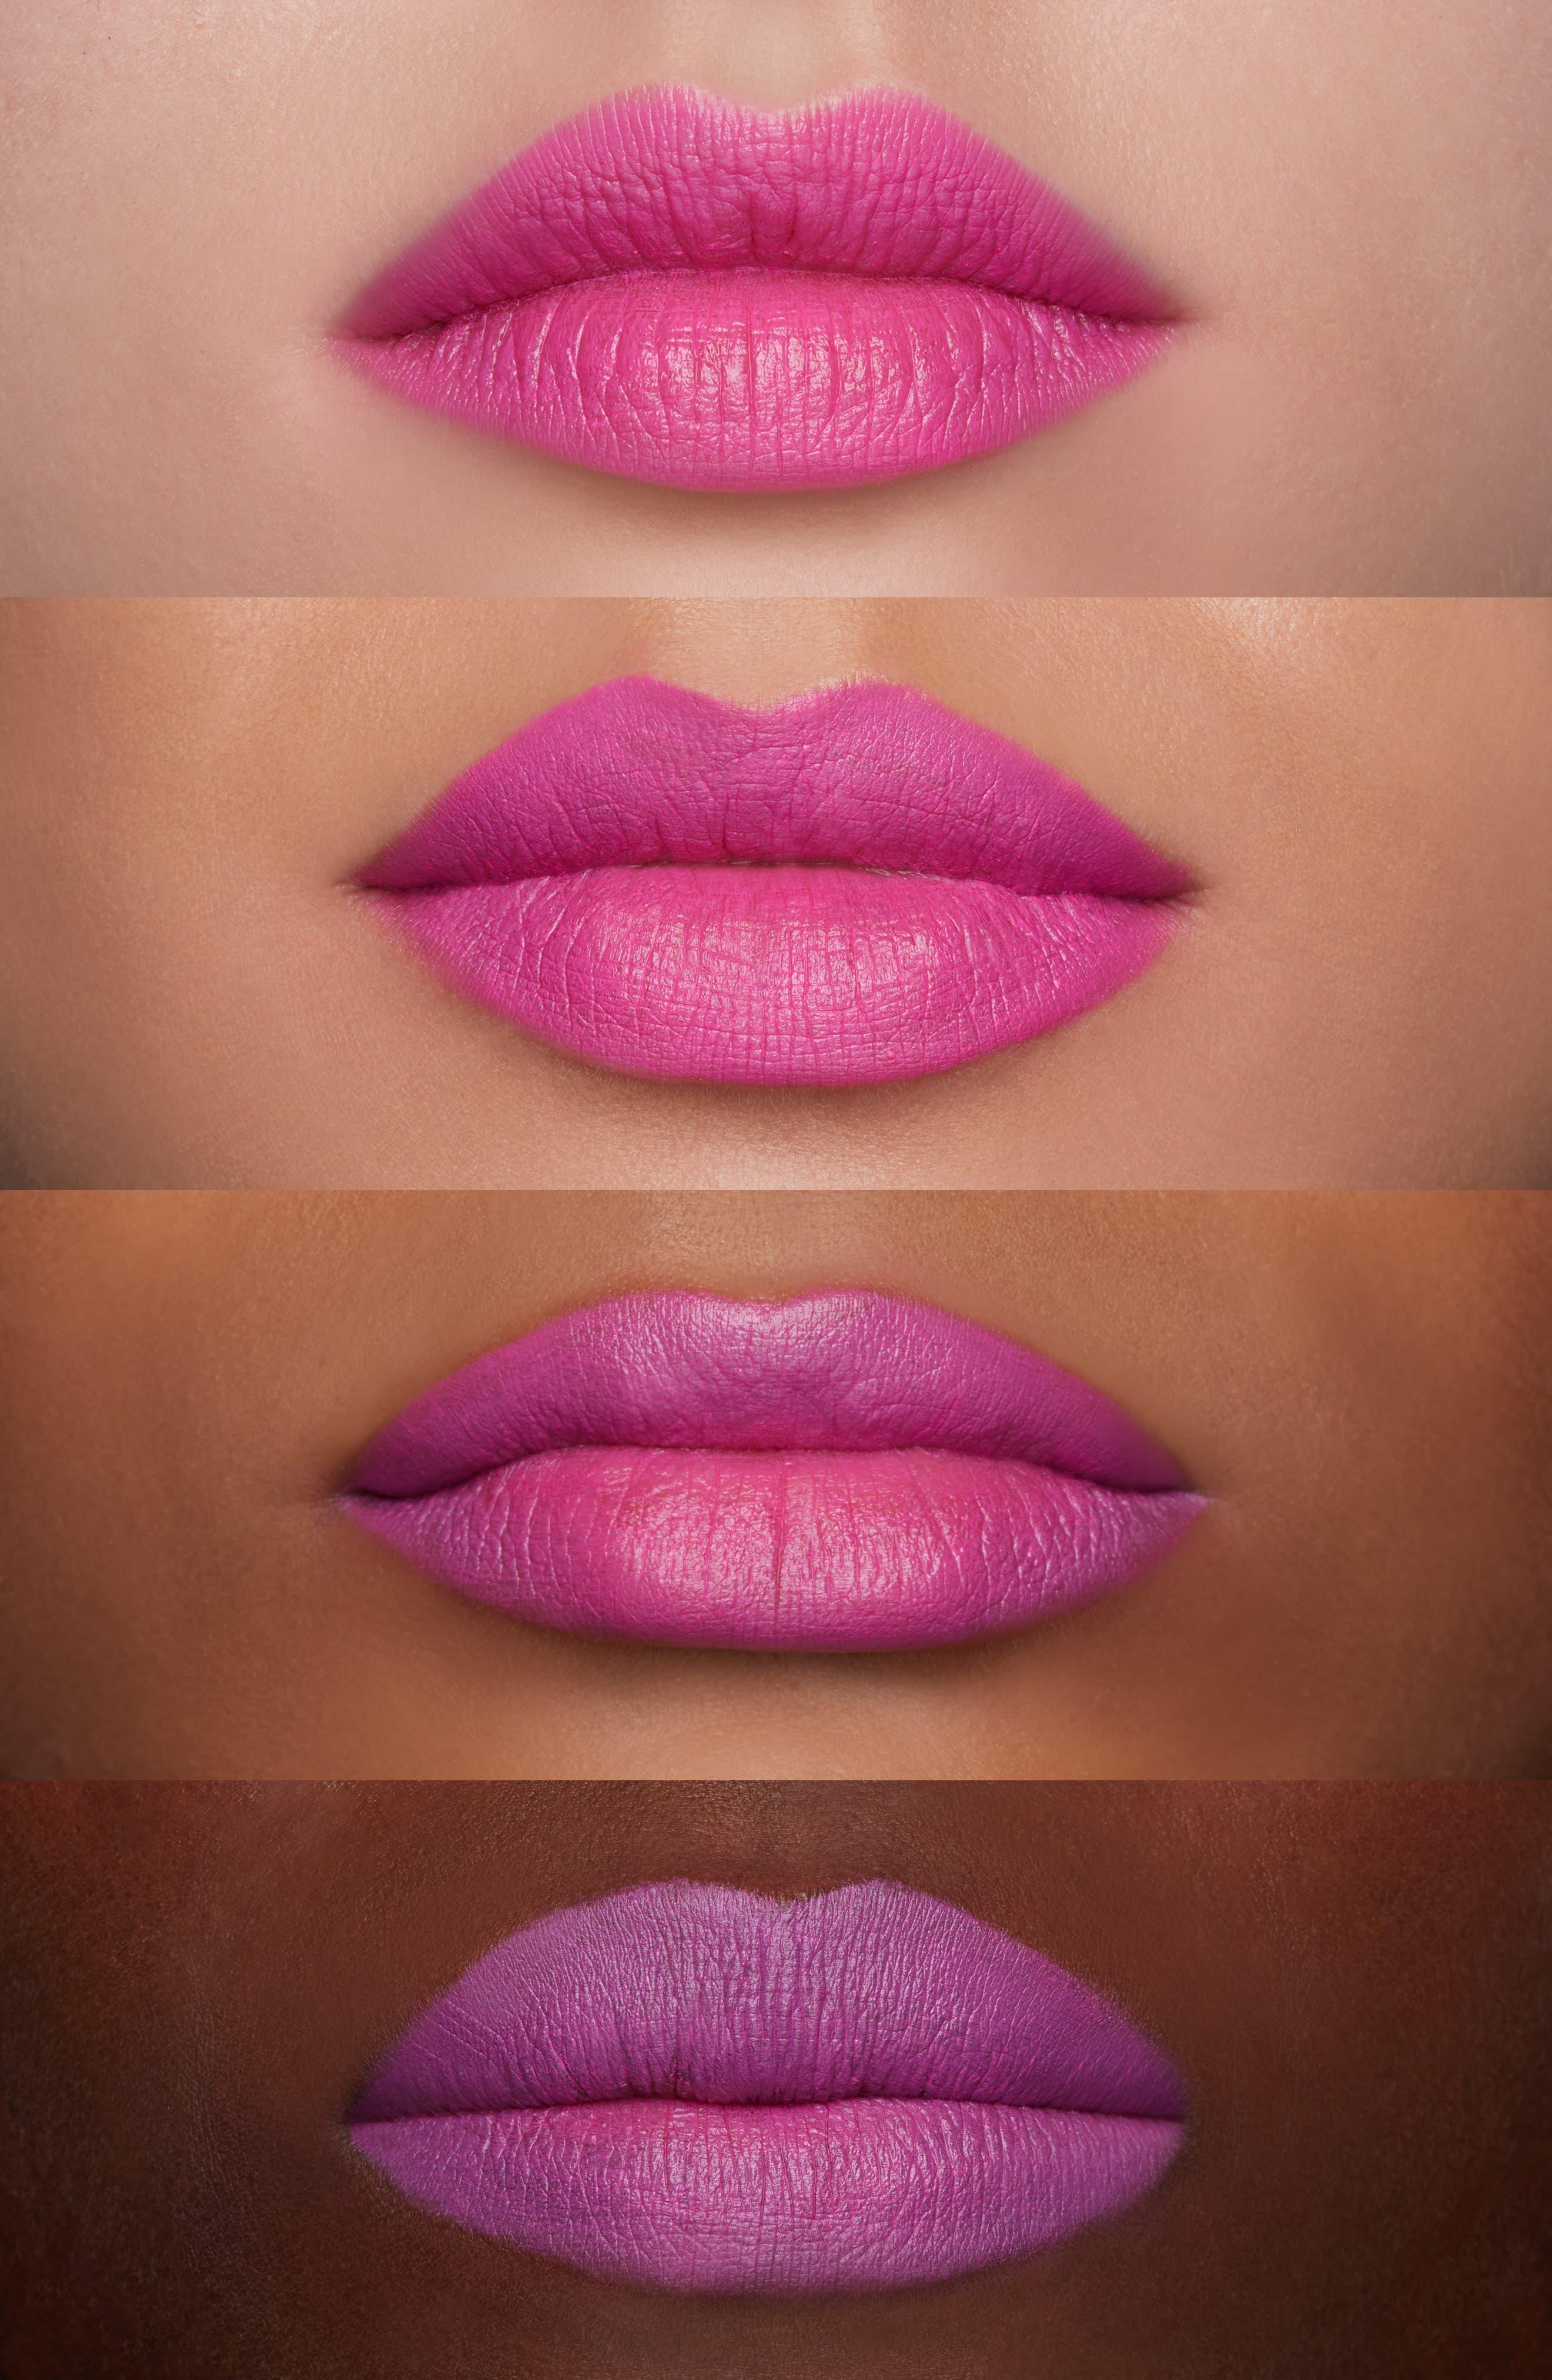 MAC COSMETICS, MAC Candy Yum-Yum Shadescent Lipstick, Alternate thumbnail 2, color, 650